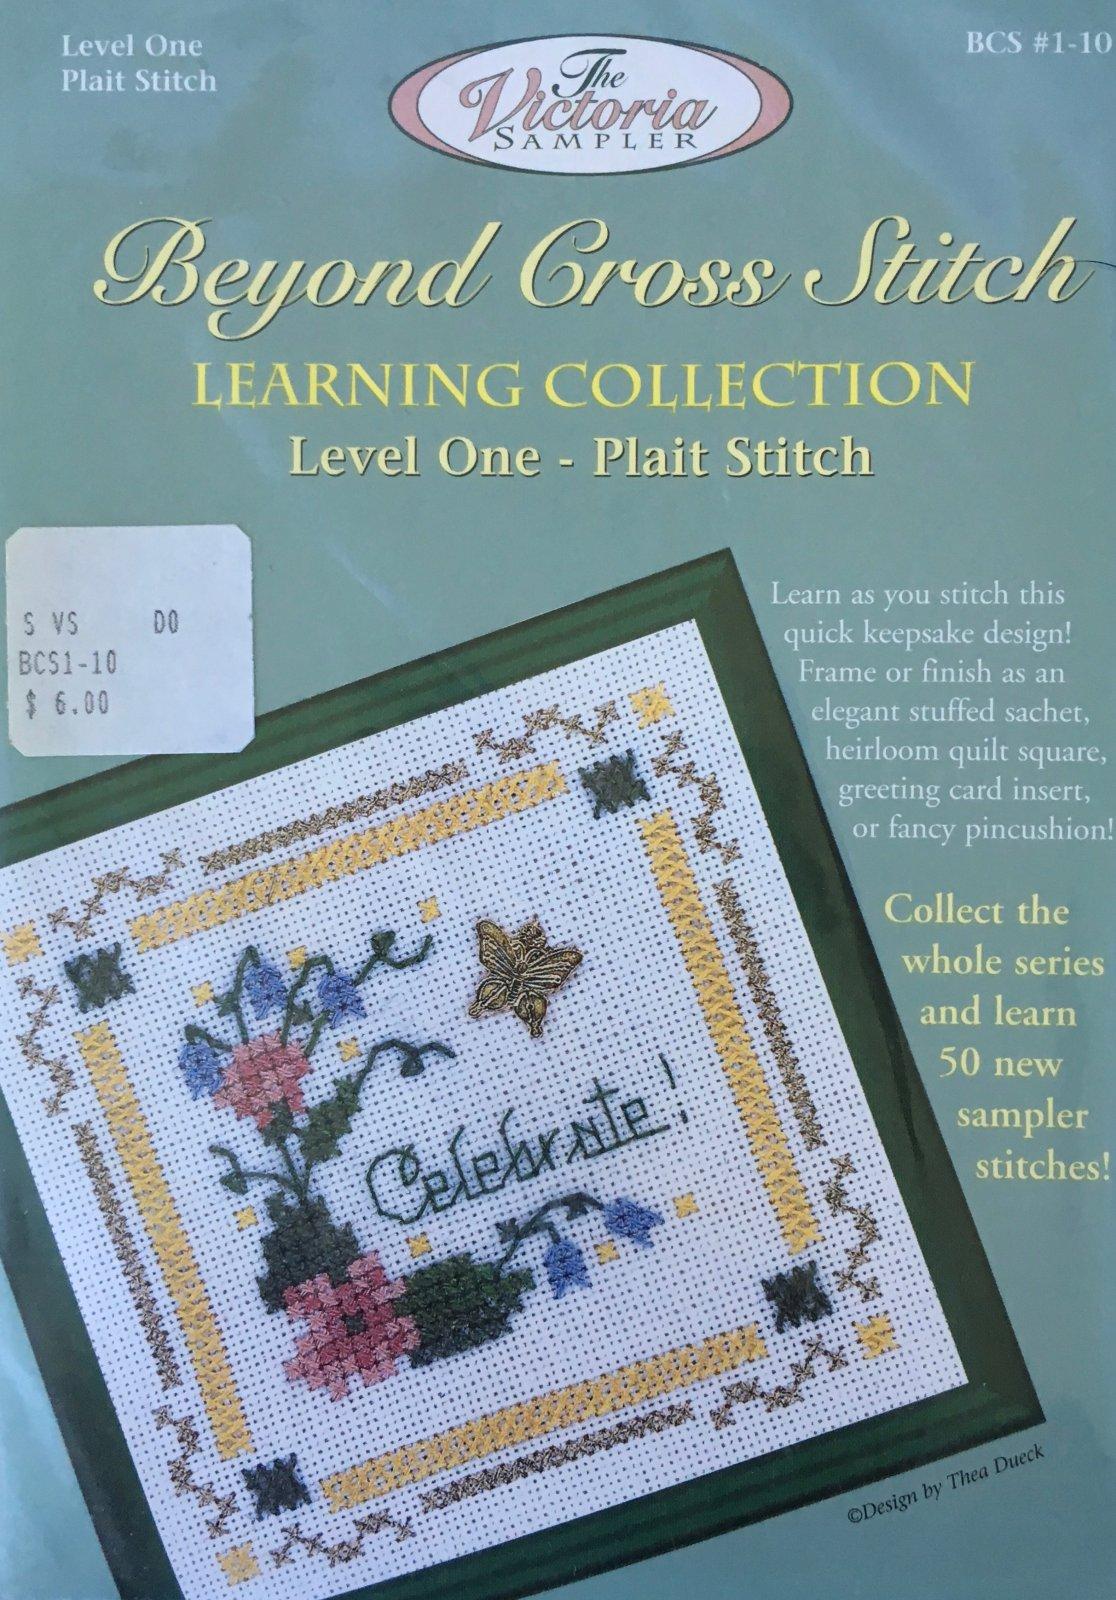 The Victoria Sampler: Celebrate! Level 1 - #10 Kit; Plait Stitch